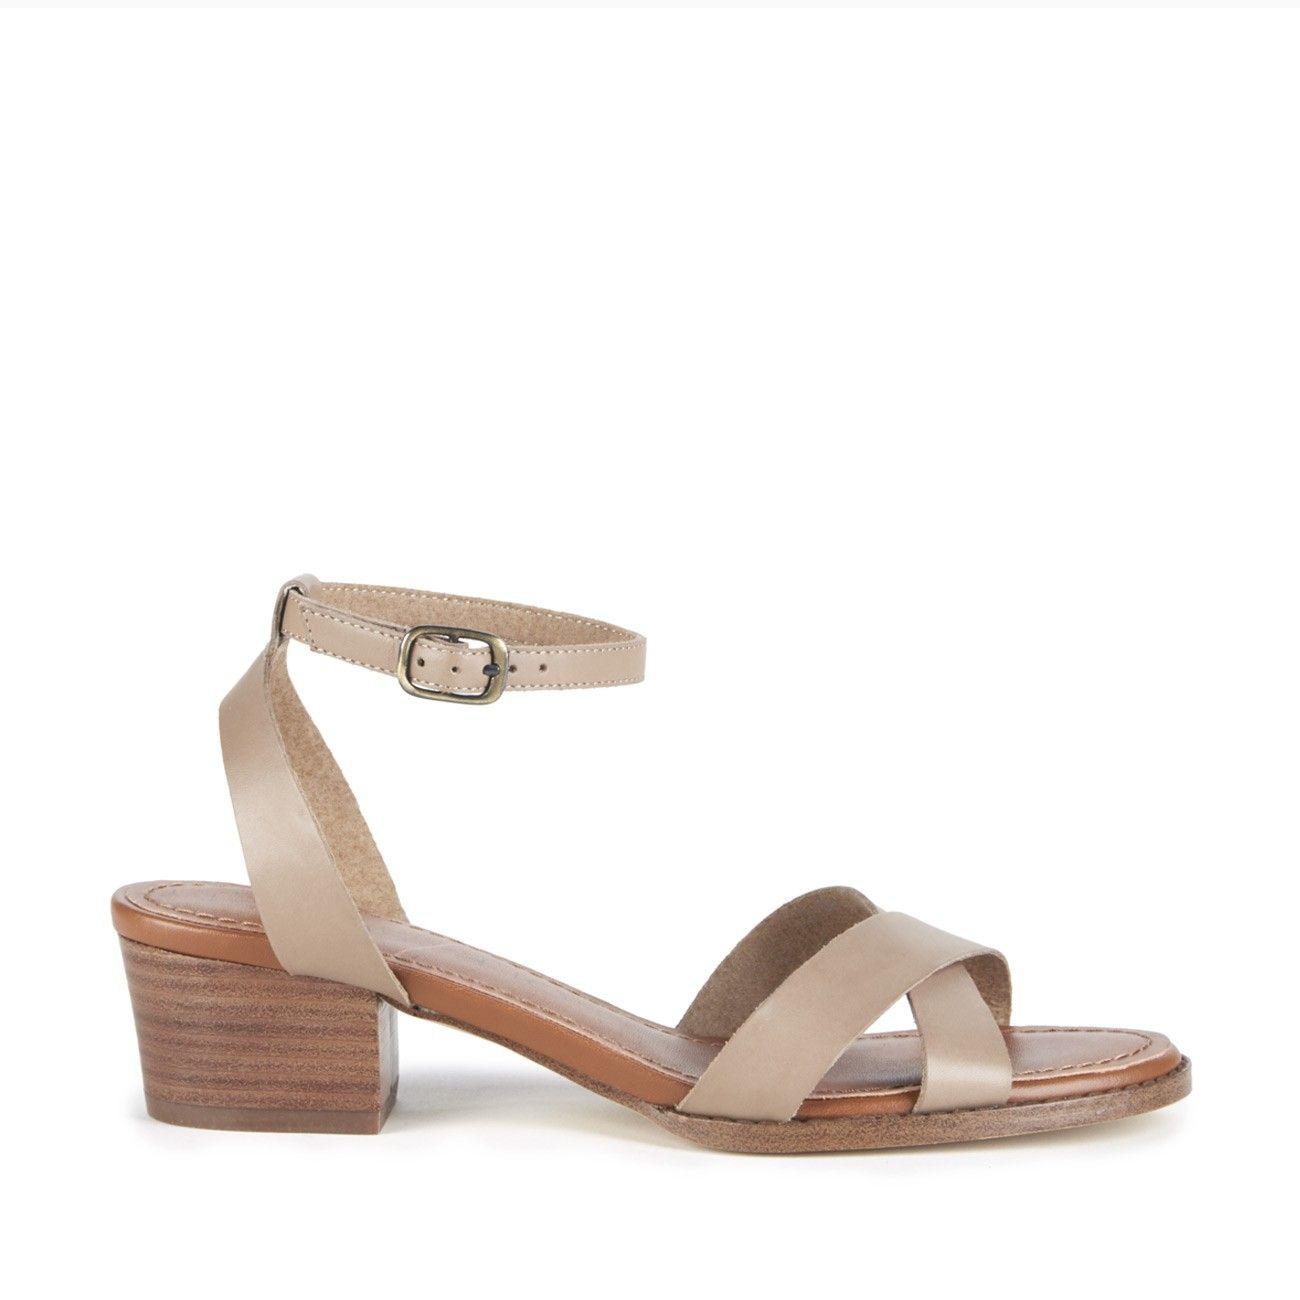 1ec9bd8e709 Savannah Block Heel Low Sandal - Night Taupe-5. Sole Society ...